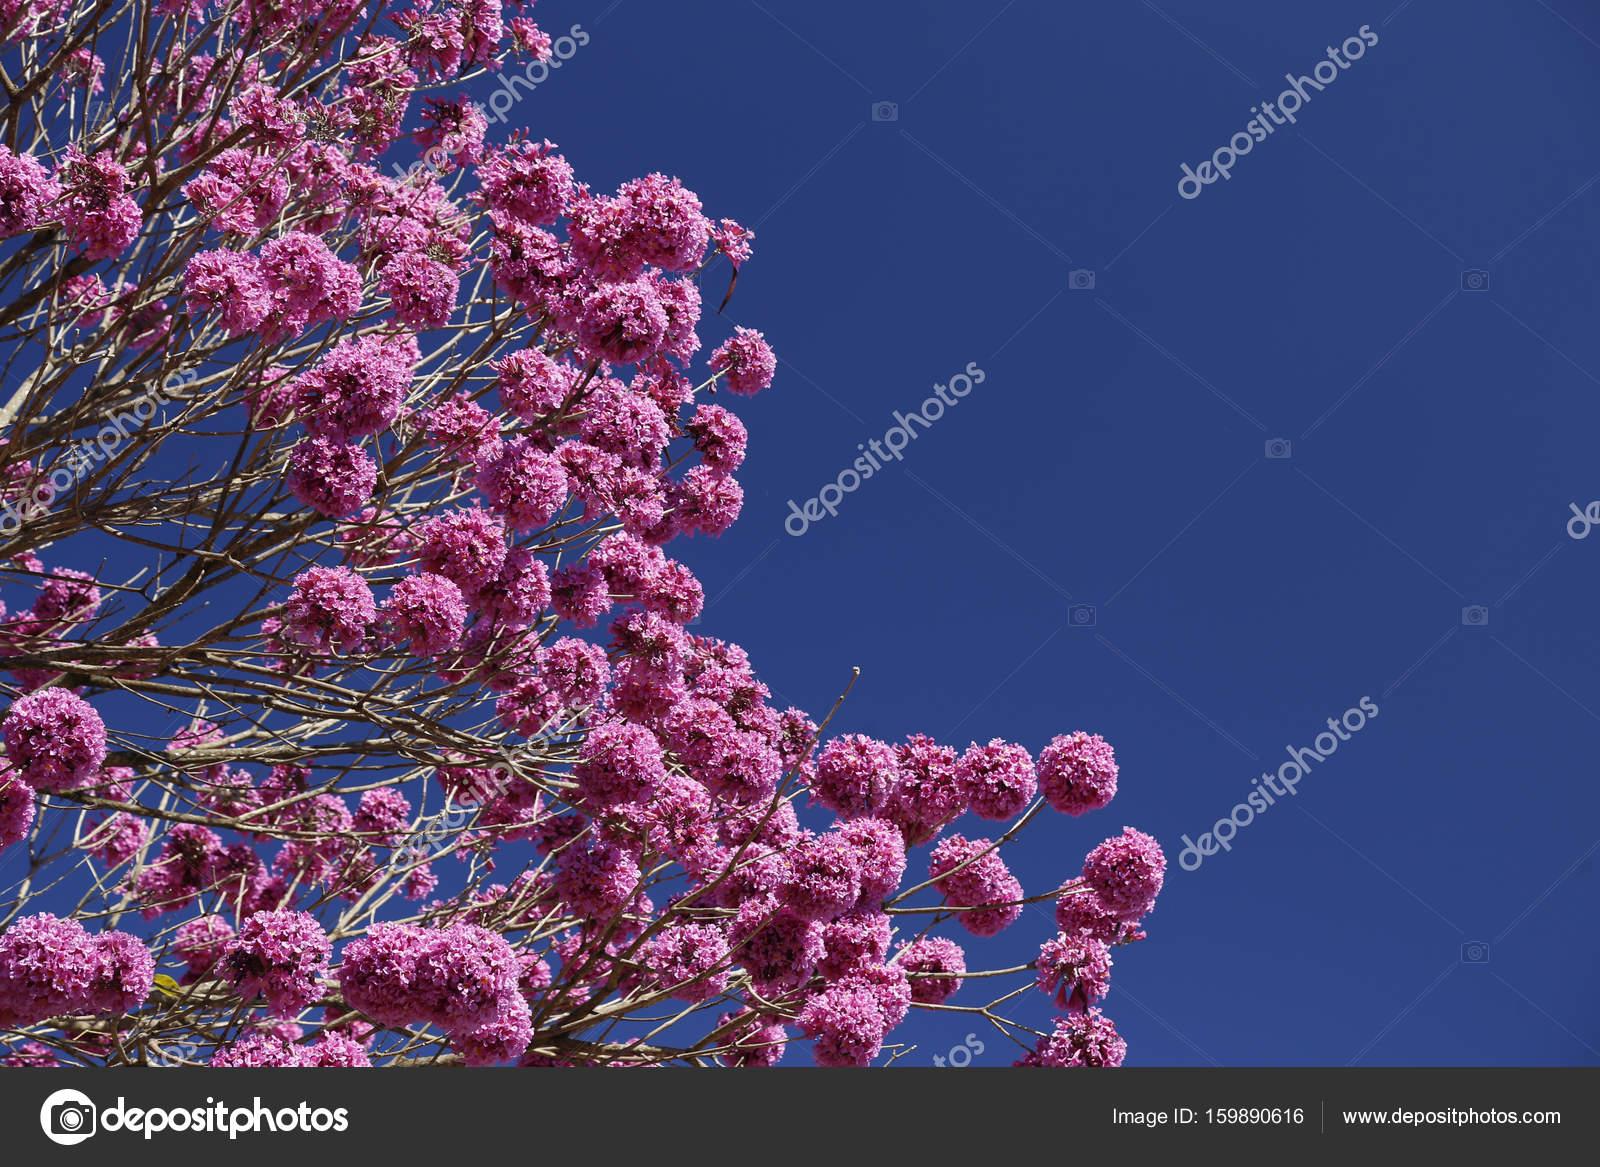 Purple yellow tree with blue sky stock photo sidneydealmeida purple yellow tree with blue sky stock photo izmirmasajfo